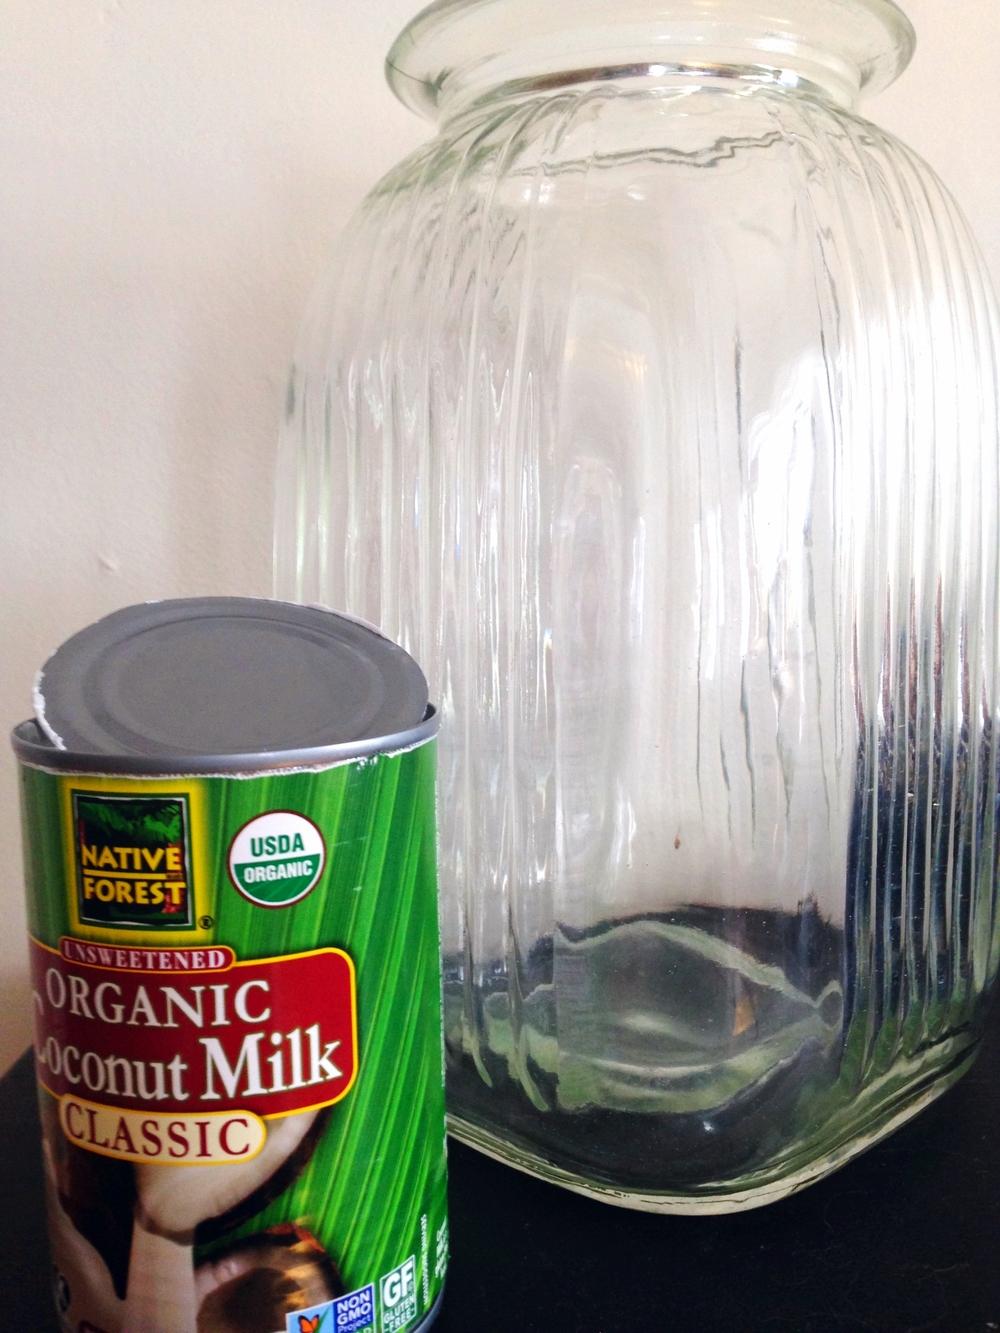 Native Forest coconut milk + big glass jar ready to mix!